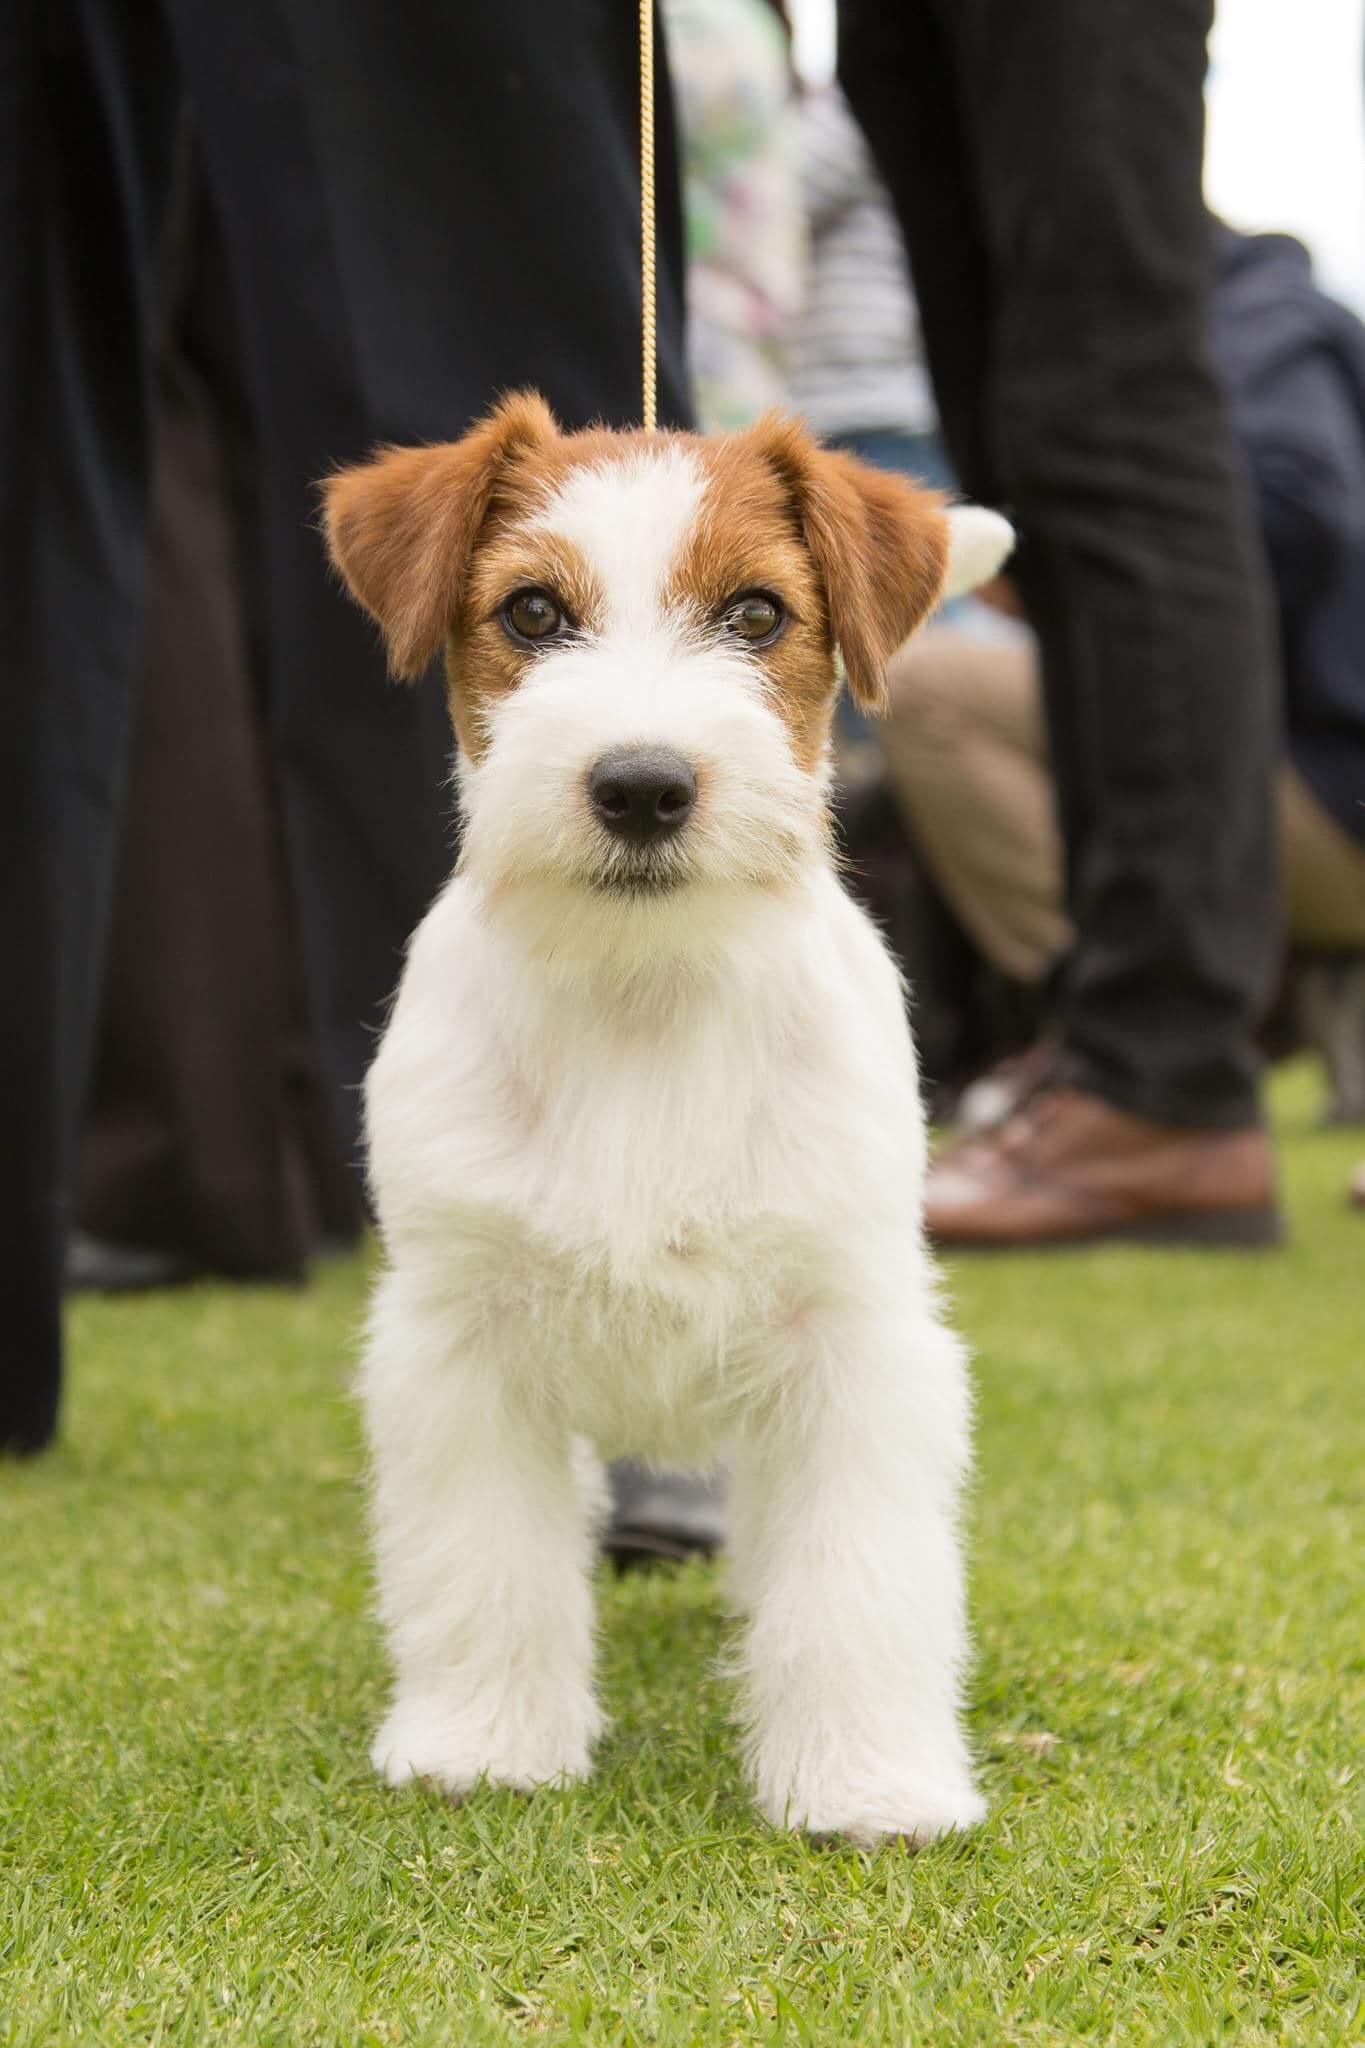 Jack Russell terrier - Wikipedia 1bd49844b64